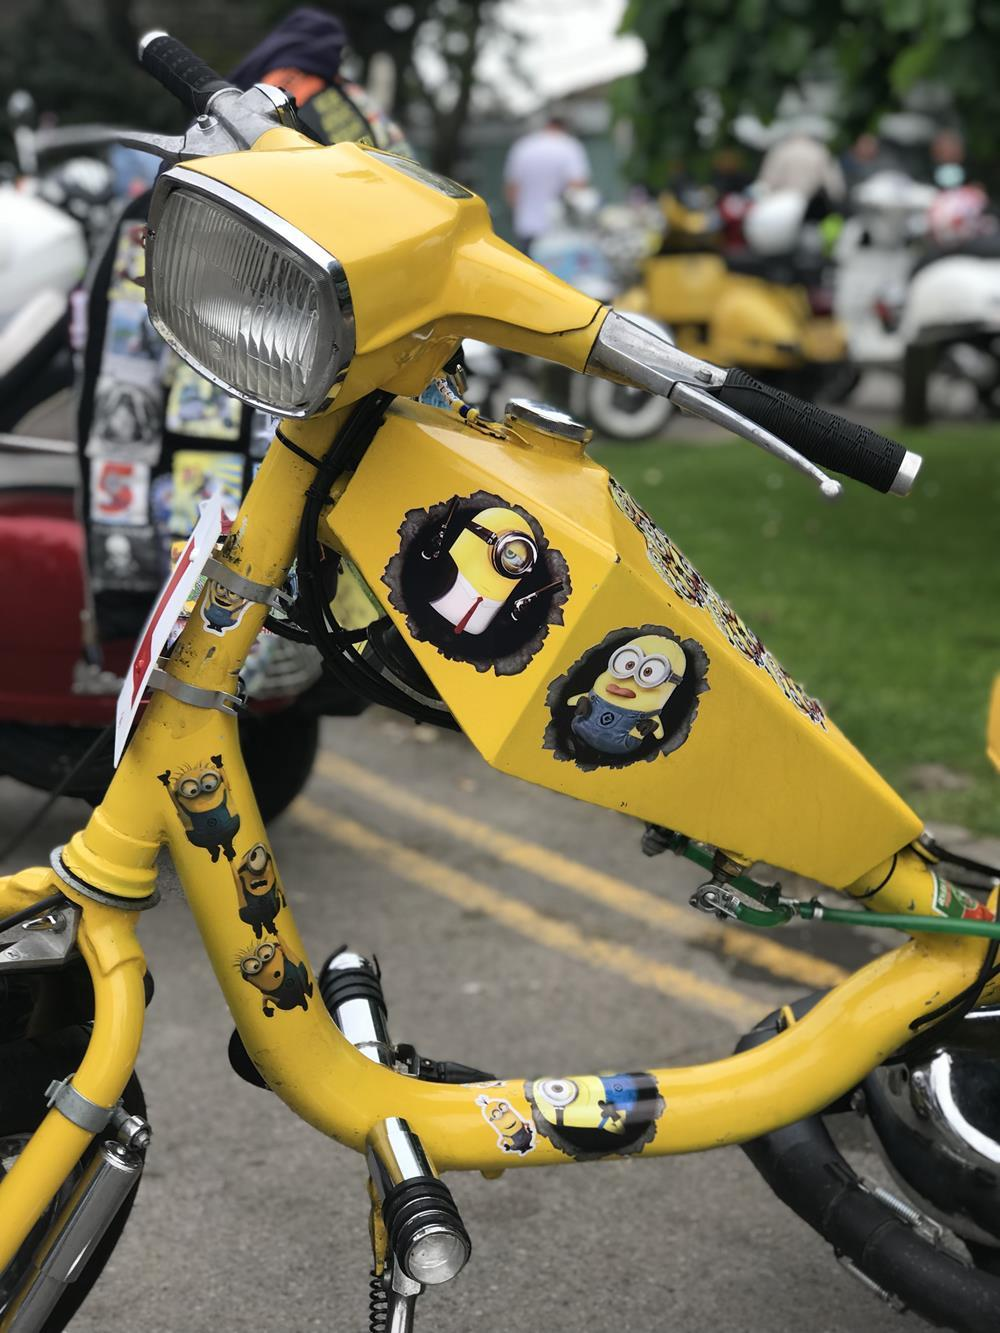 Yellow Lambretta petrol tank with Minion murals